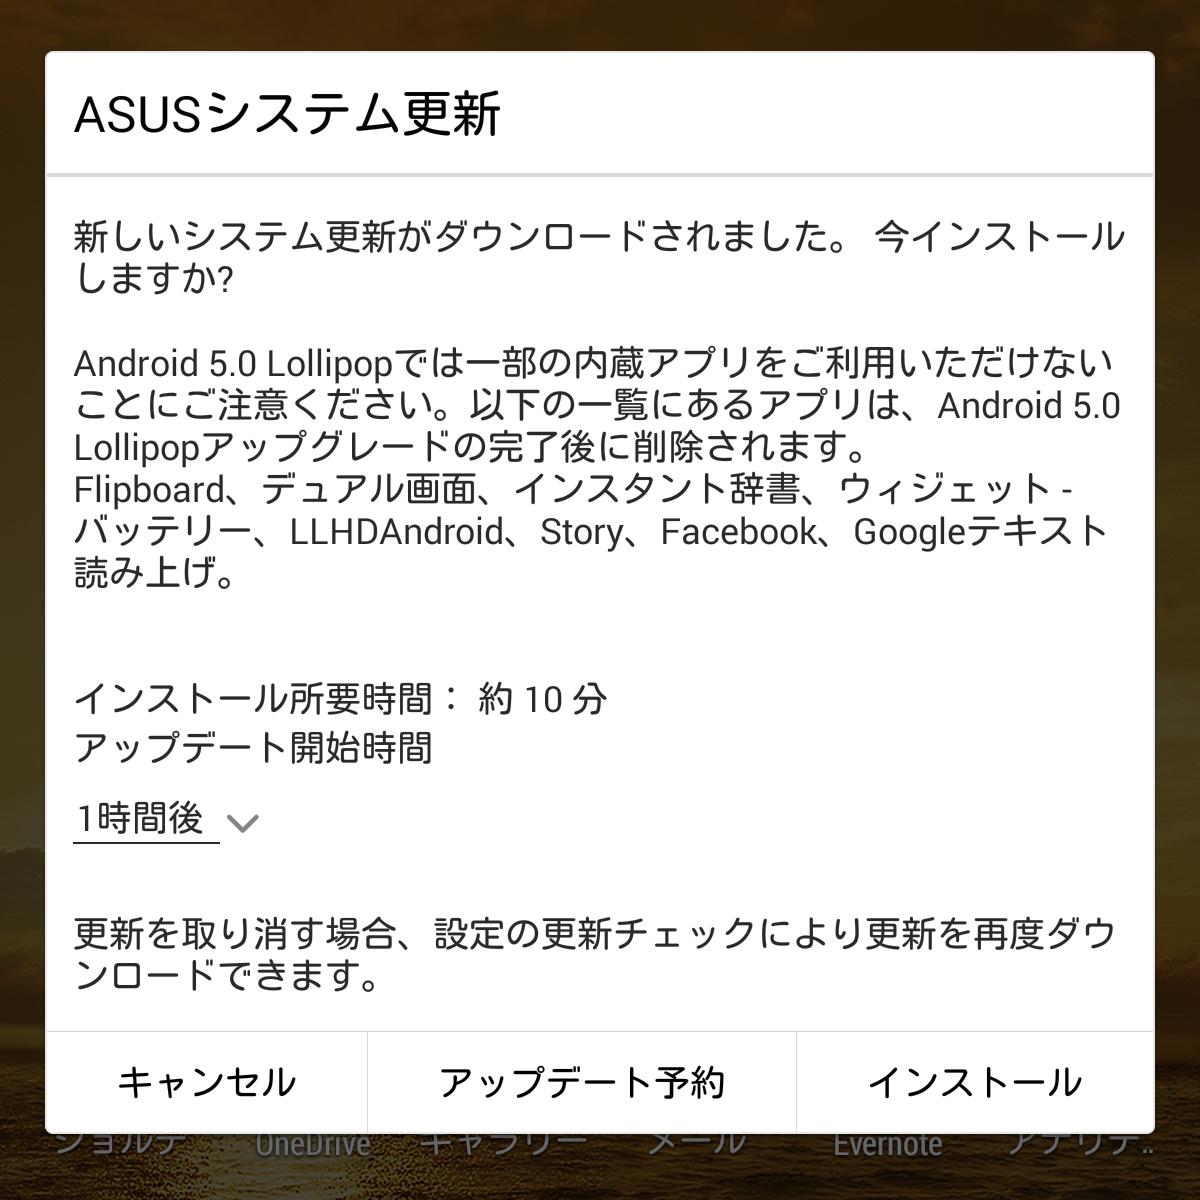 ASUS MeMO Pad 7(ME572CL)のLollipopアップデートがキター